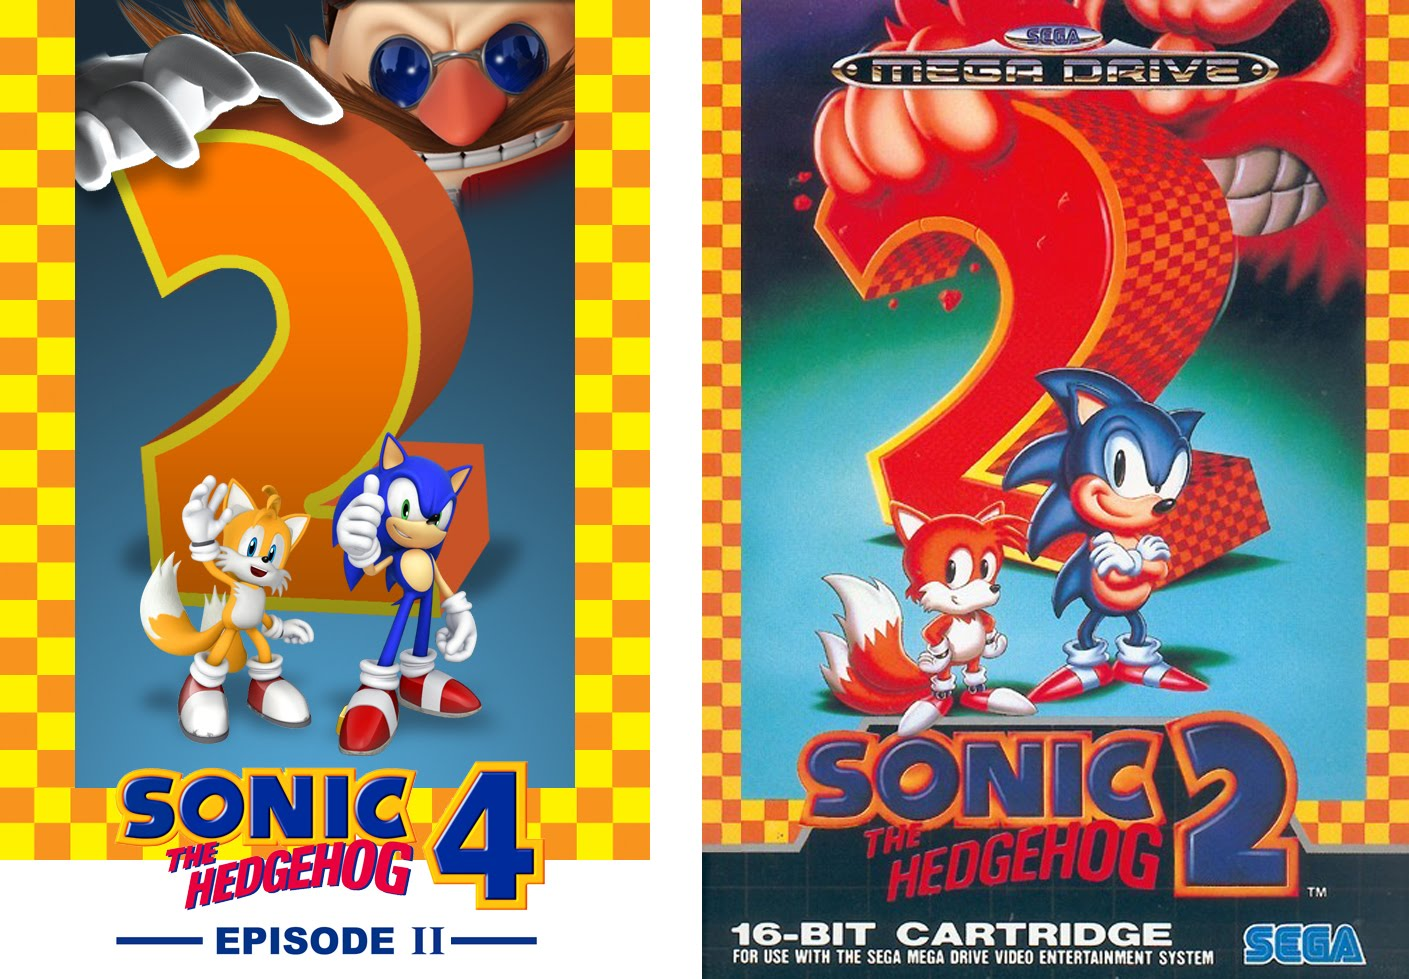 Sega Memories Sonic The Hedgehog 2 Modern Remix